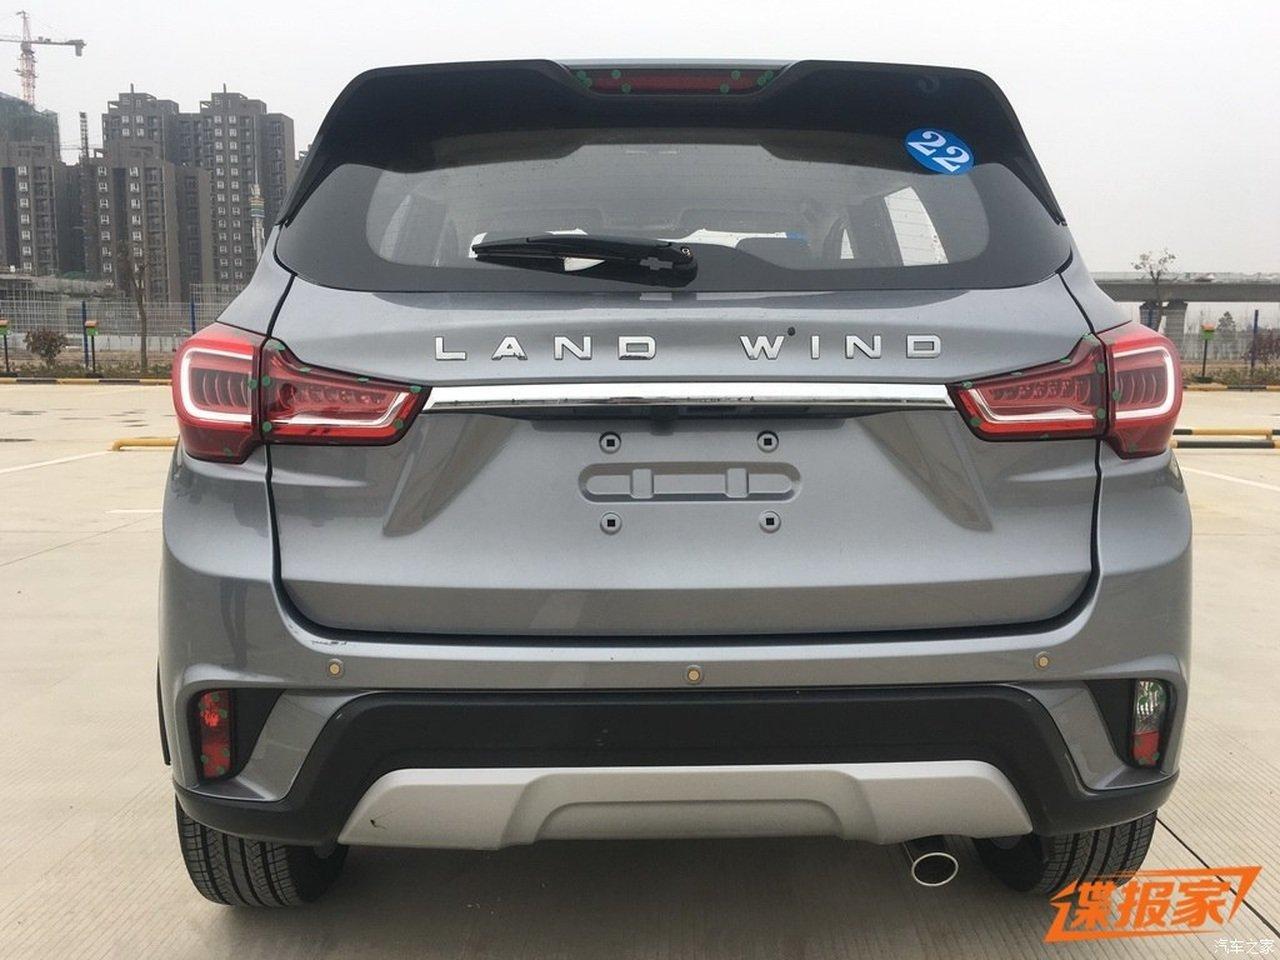 Landwind E36 - клон Lada Xray/Vesta